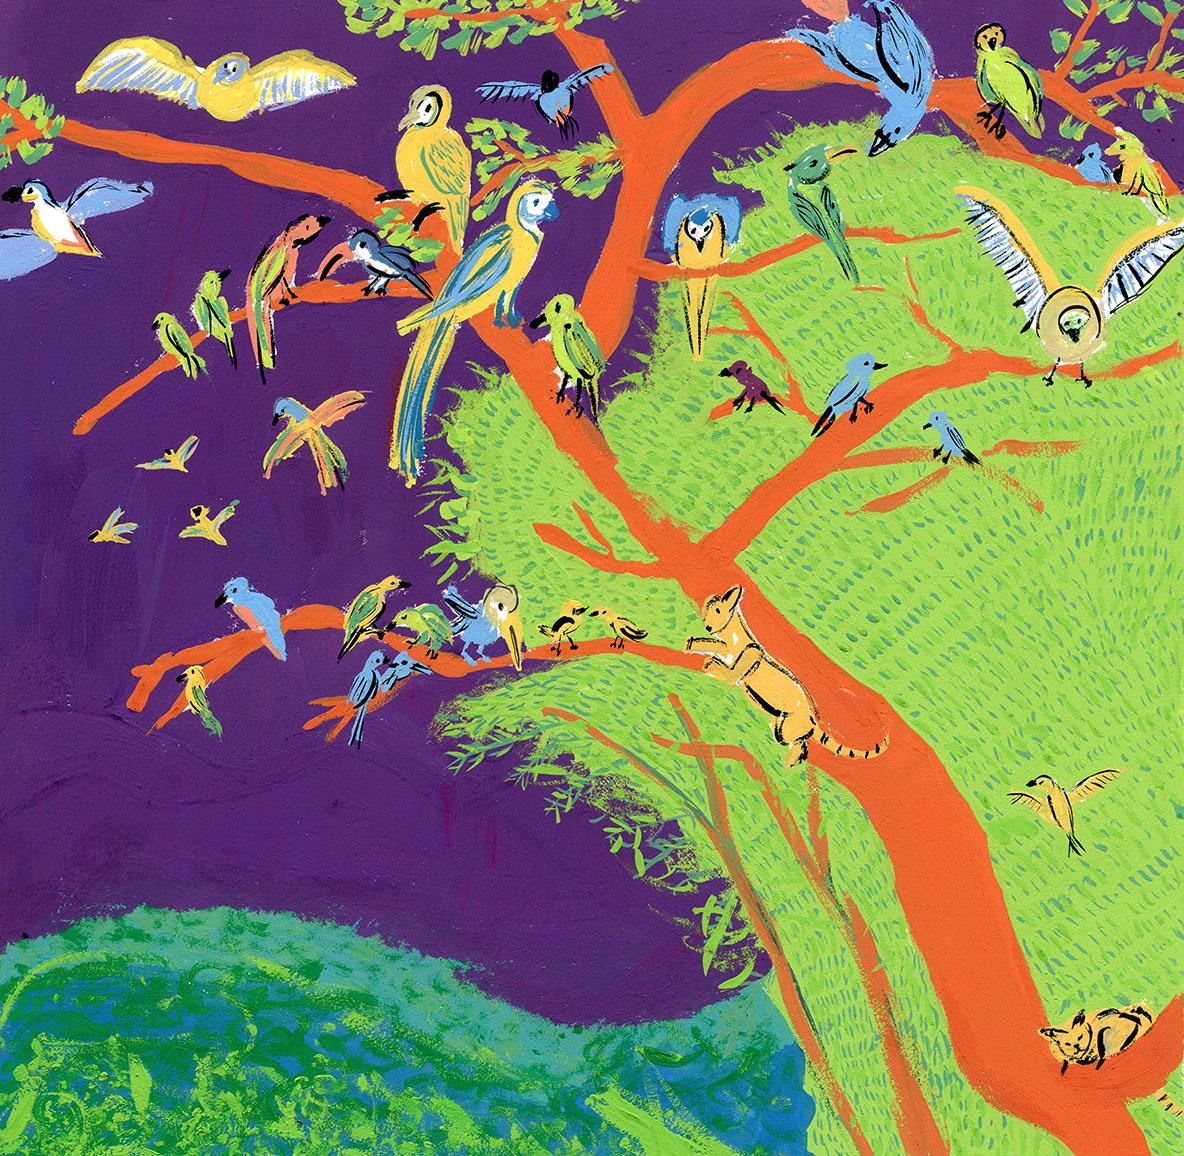 Bird Painting 100 Day Project Illustration.jpg